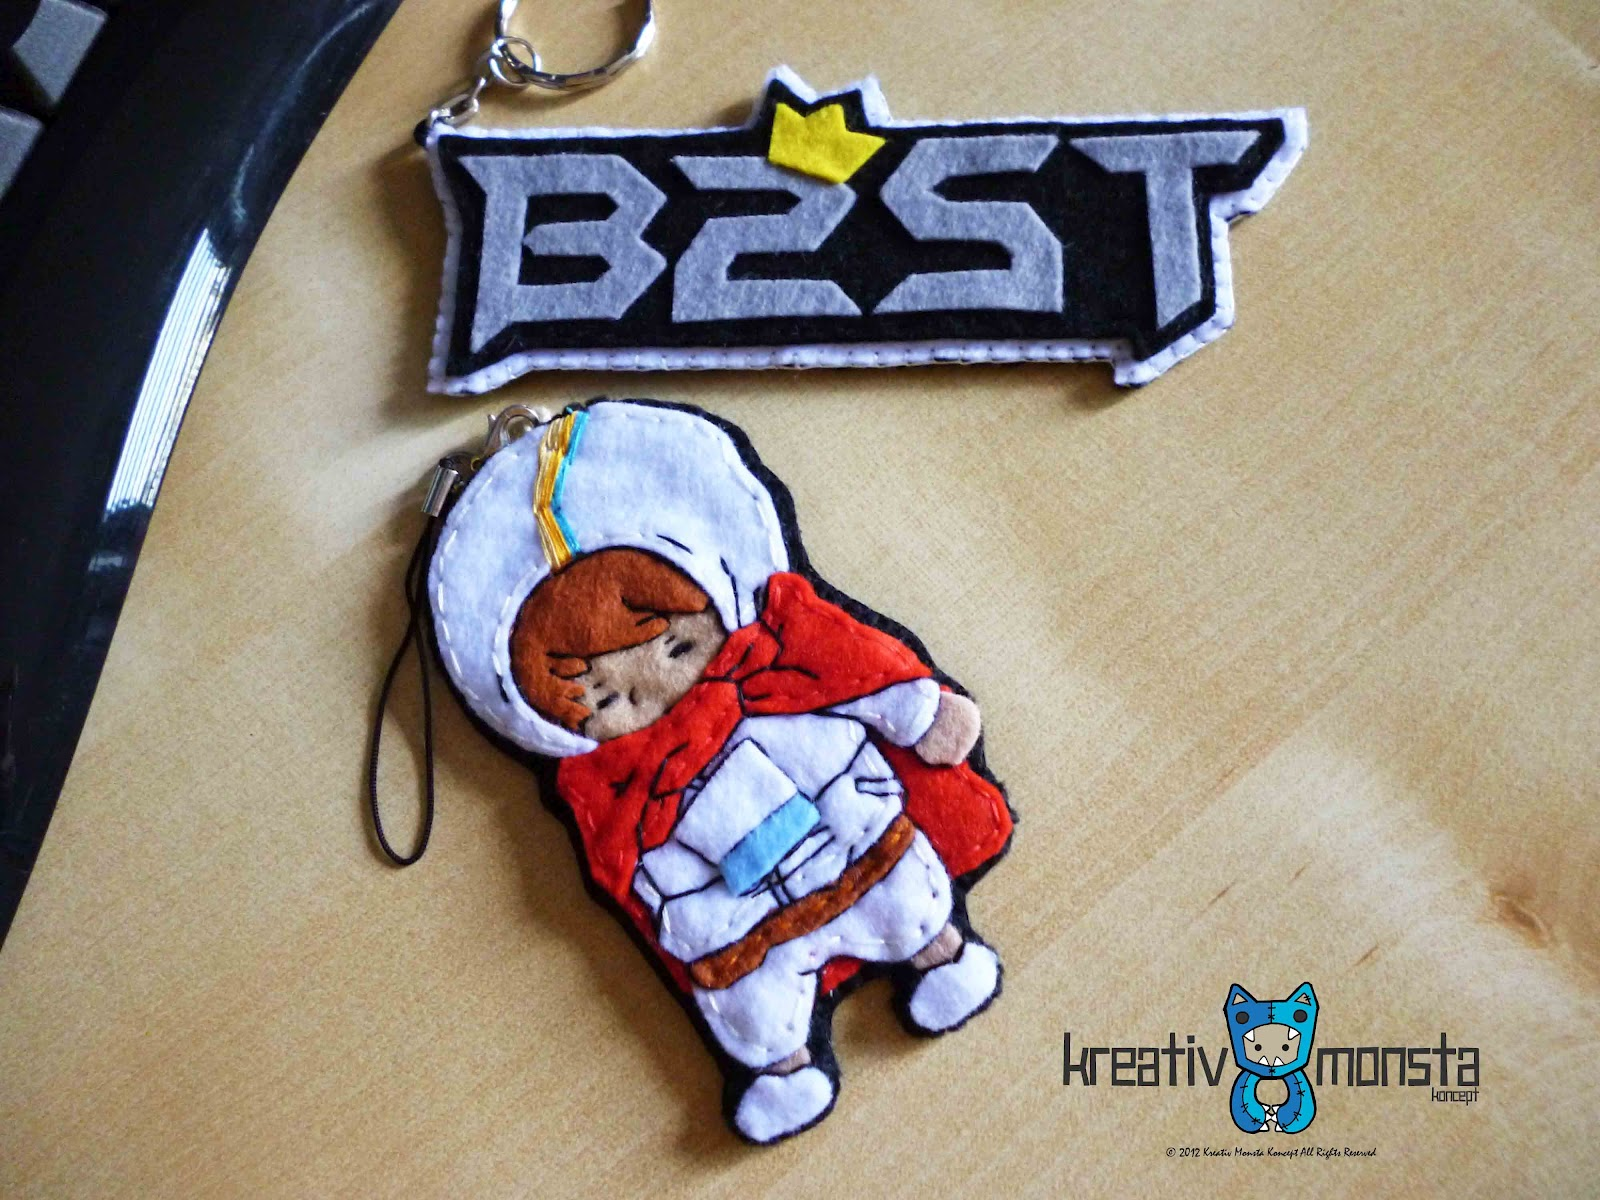 Kreativ.Monsta: B2ST logo & YoSeob chibi